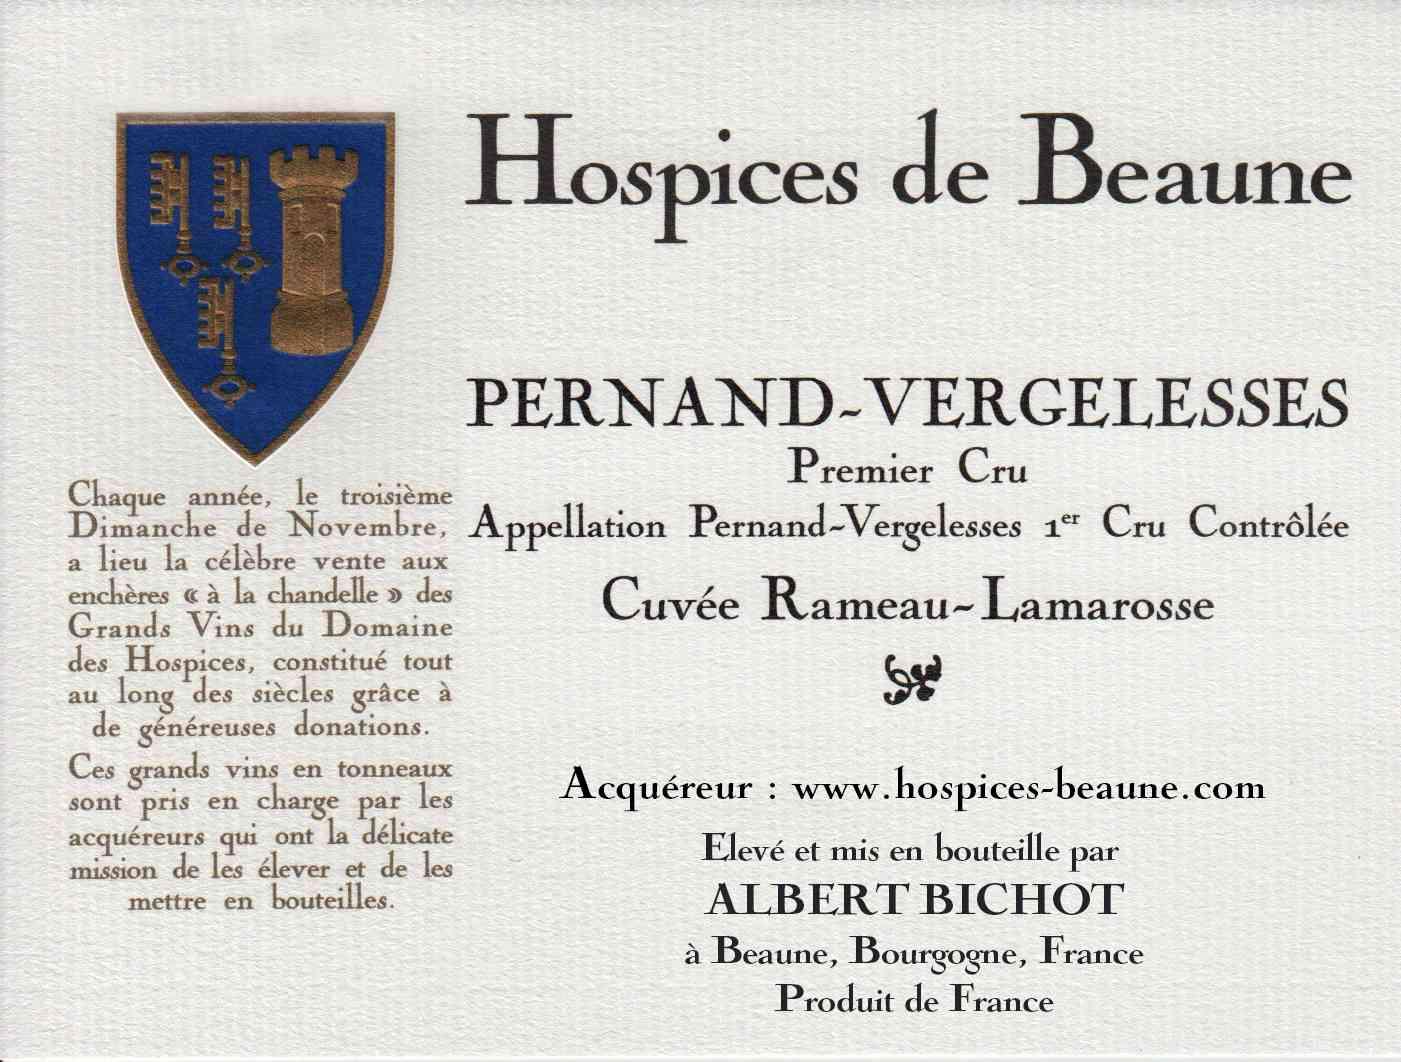 Encheres-auction-HospicesdeBeaune-AlbertBichot-PernandVergelesse-PremierCru-Cuvee-RameauLamarosse